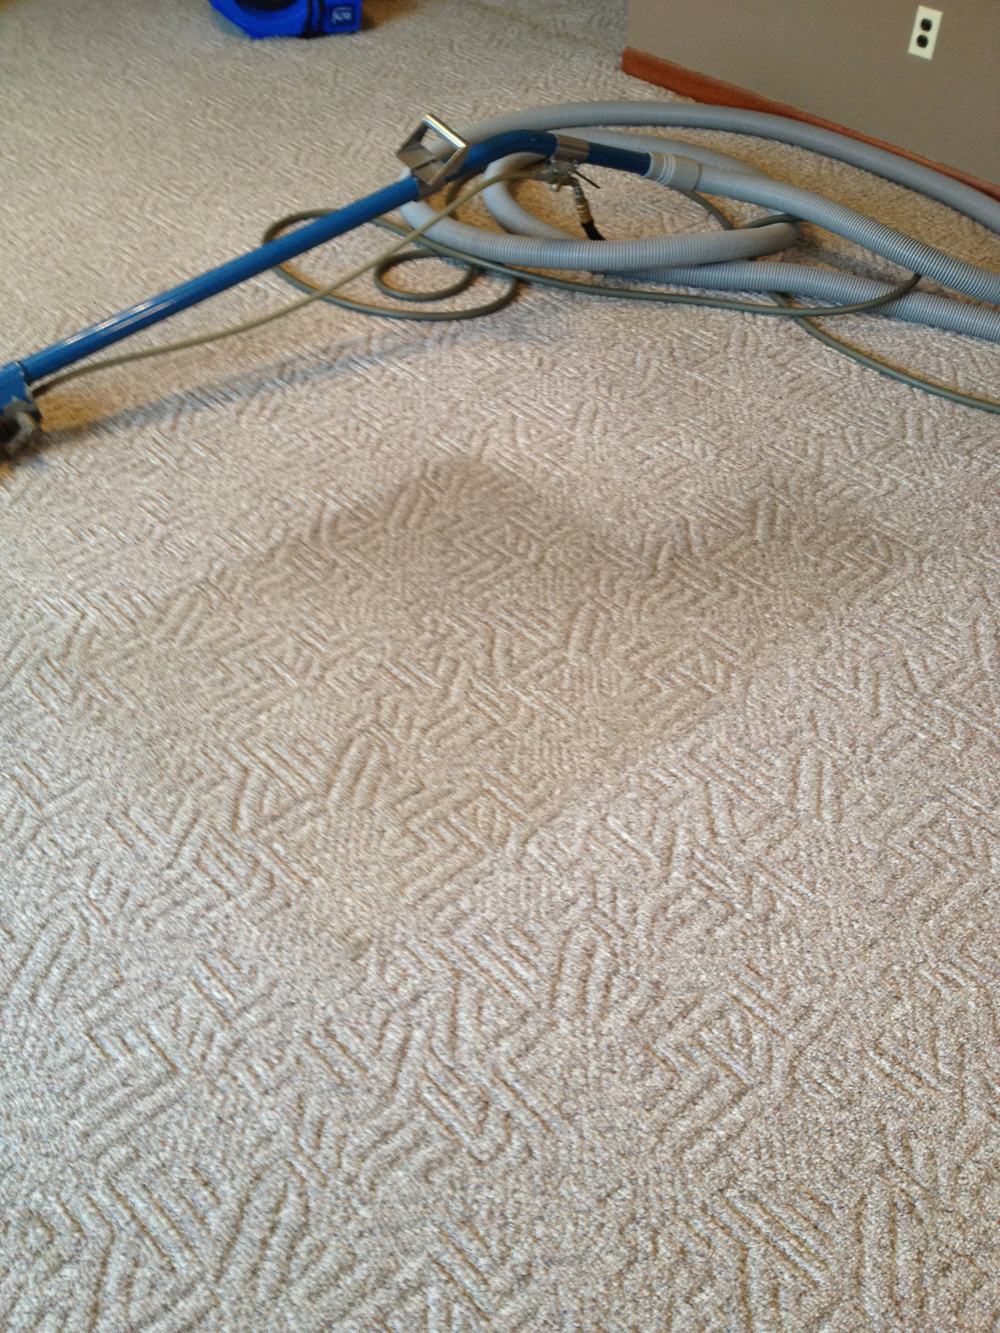 Carpet Cleaning by Ashford Carpet Clean